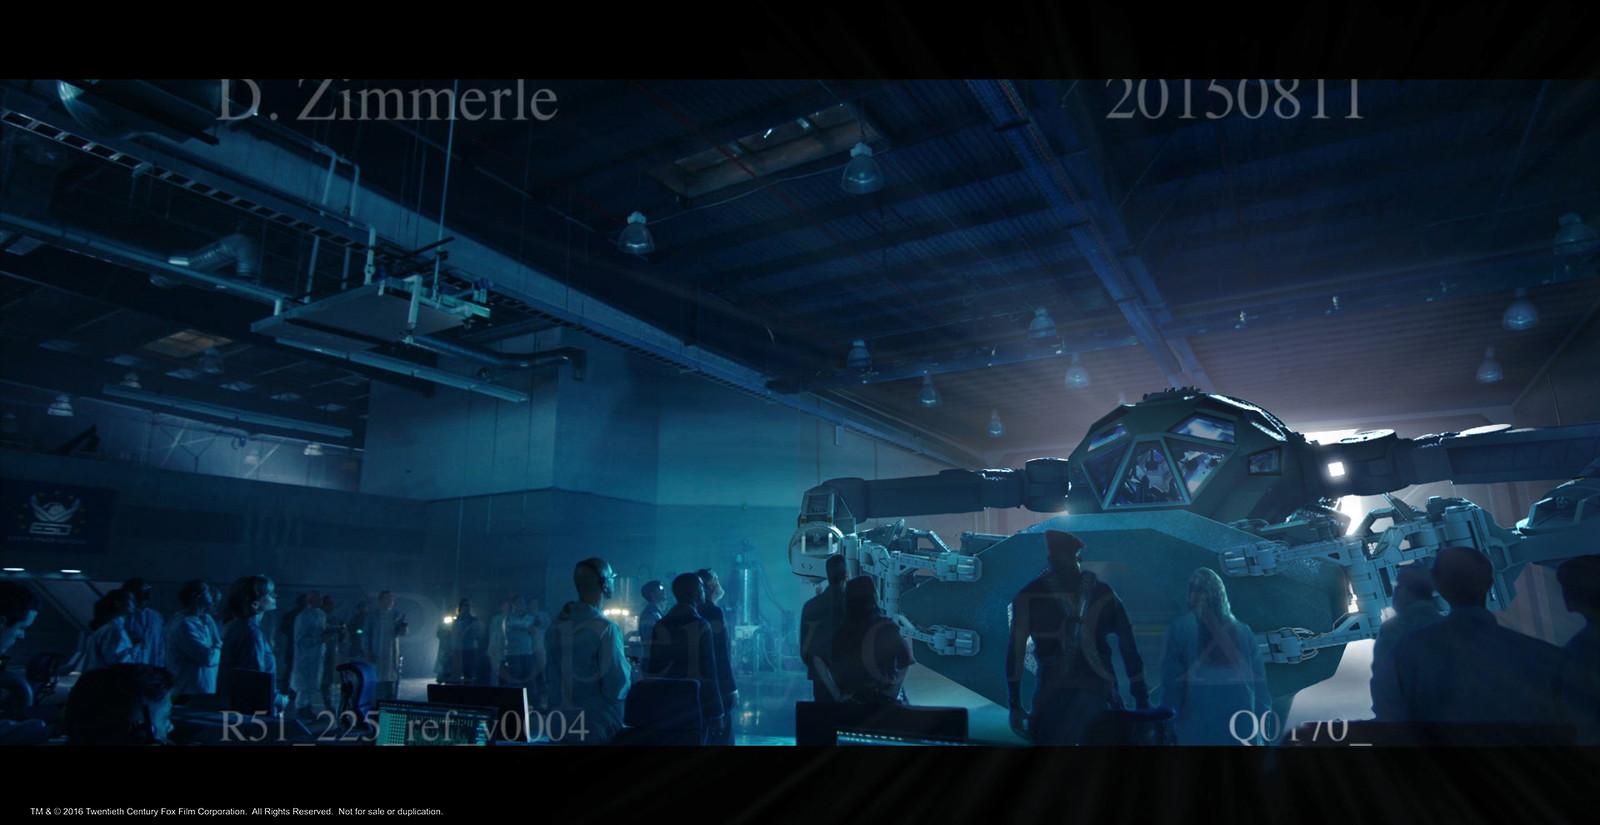 Area 51 hangar set estension.  Part 3 of 4